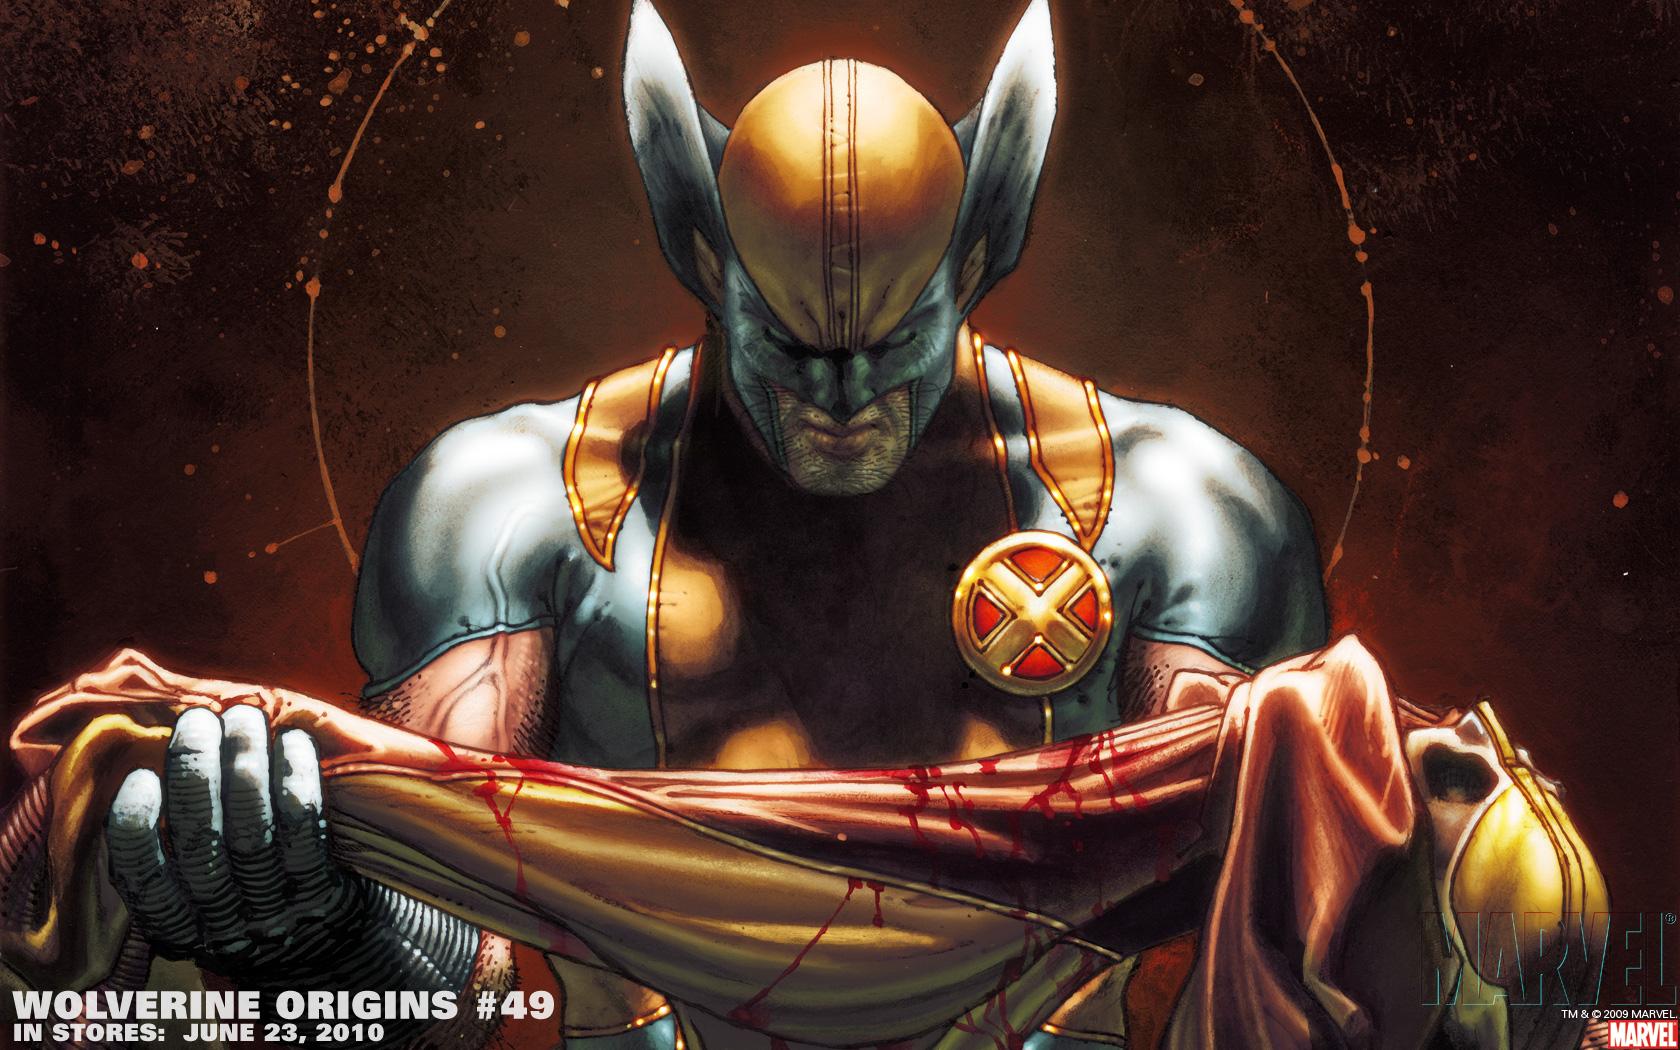 Download X Men Wolverine Wallpaper 1680x1050 Wallpoper 268386 1680x1050